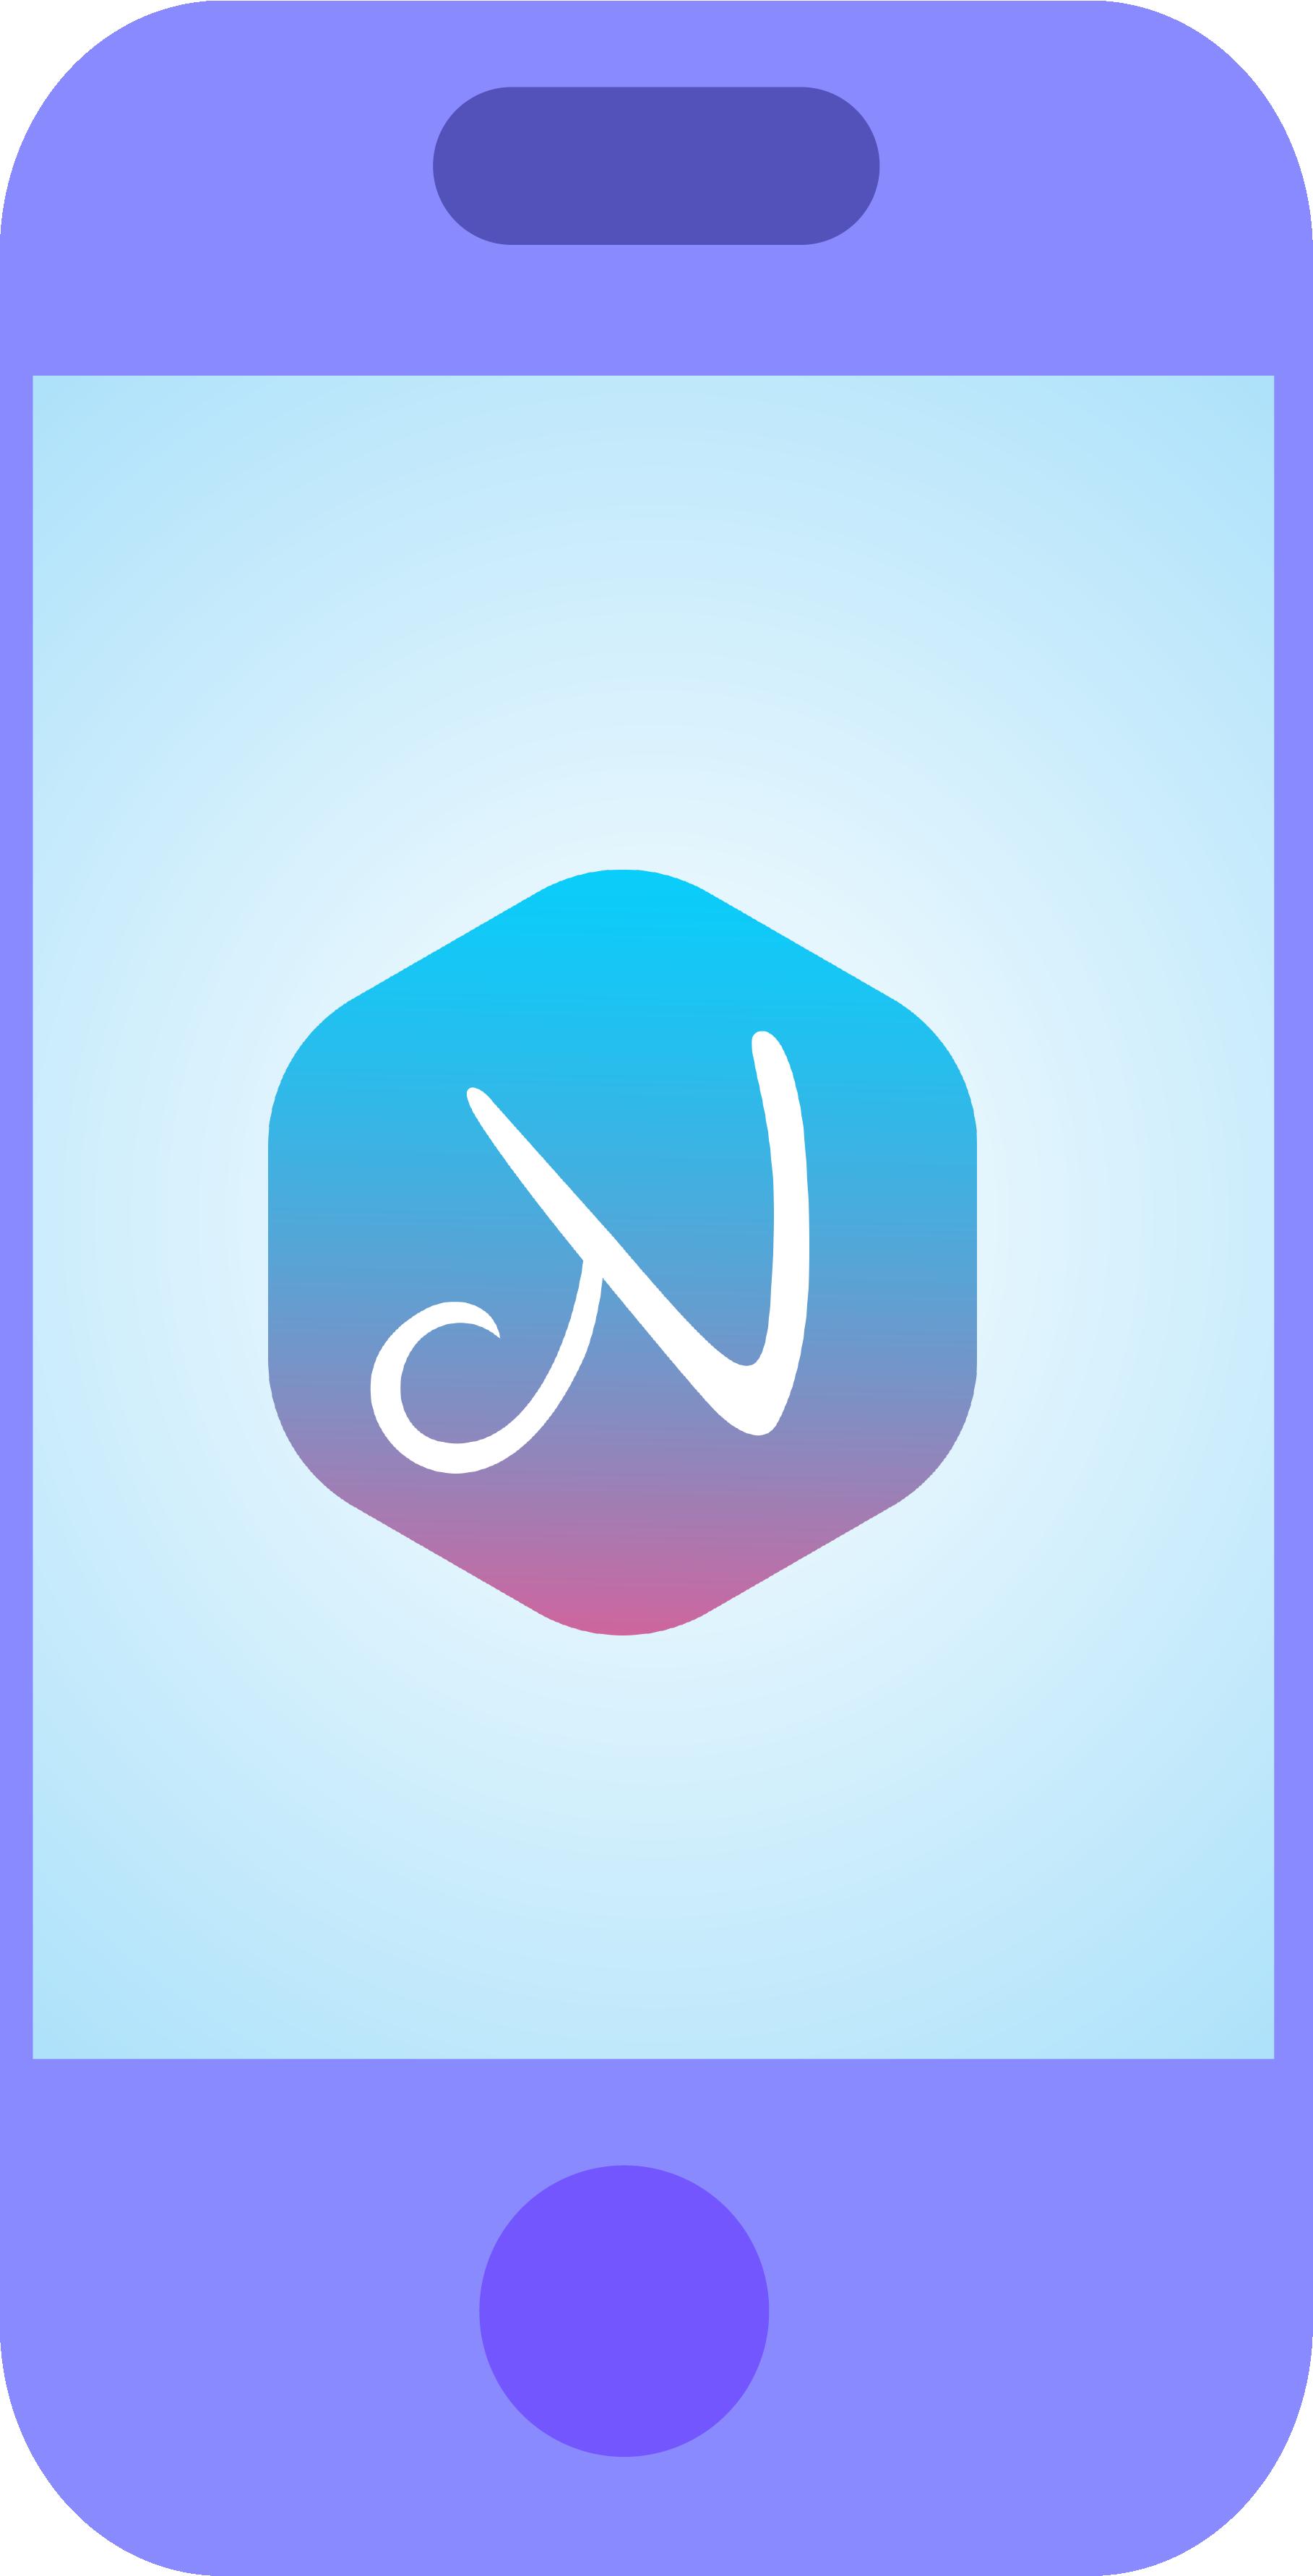 Illustration von einem Handy mit nannyly Logo